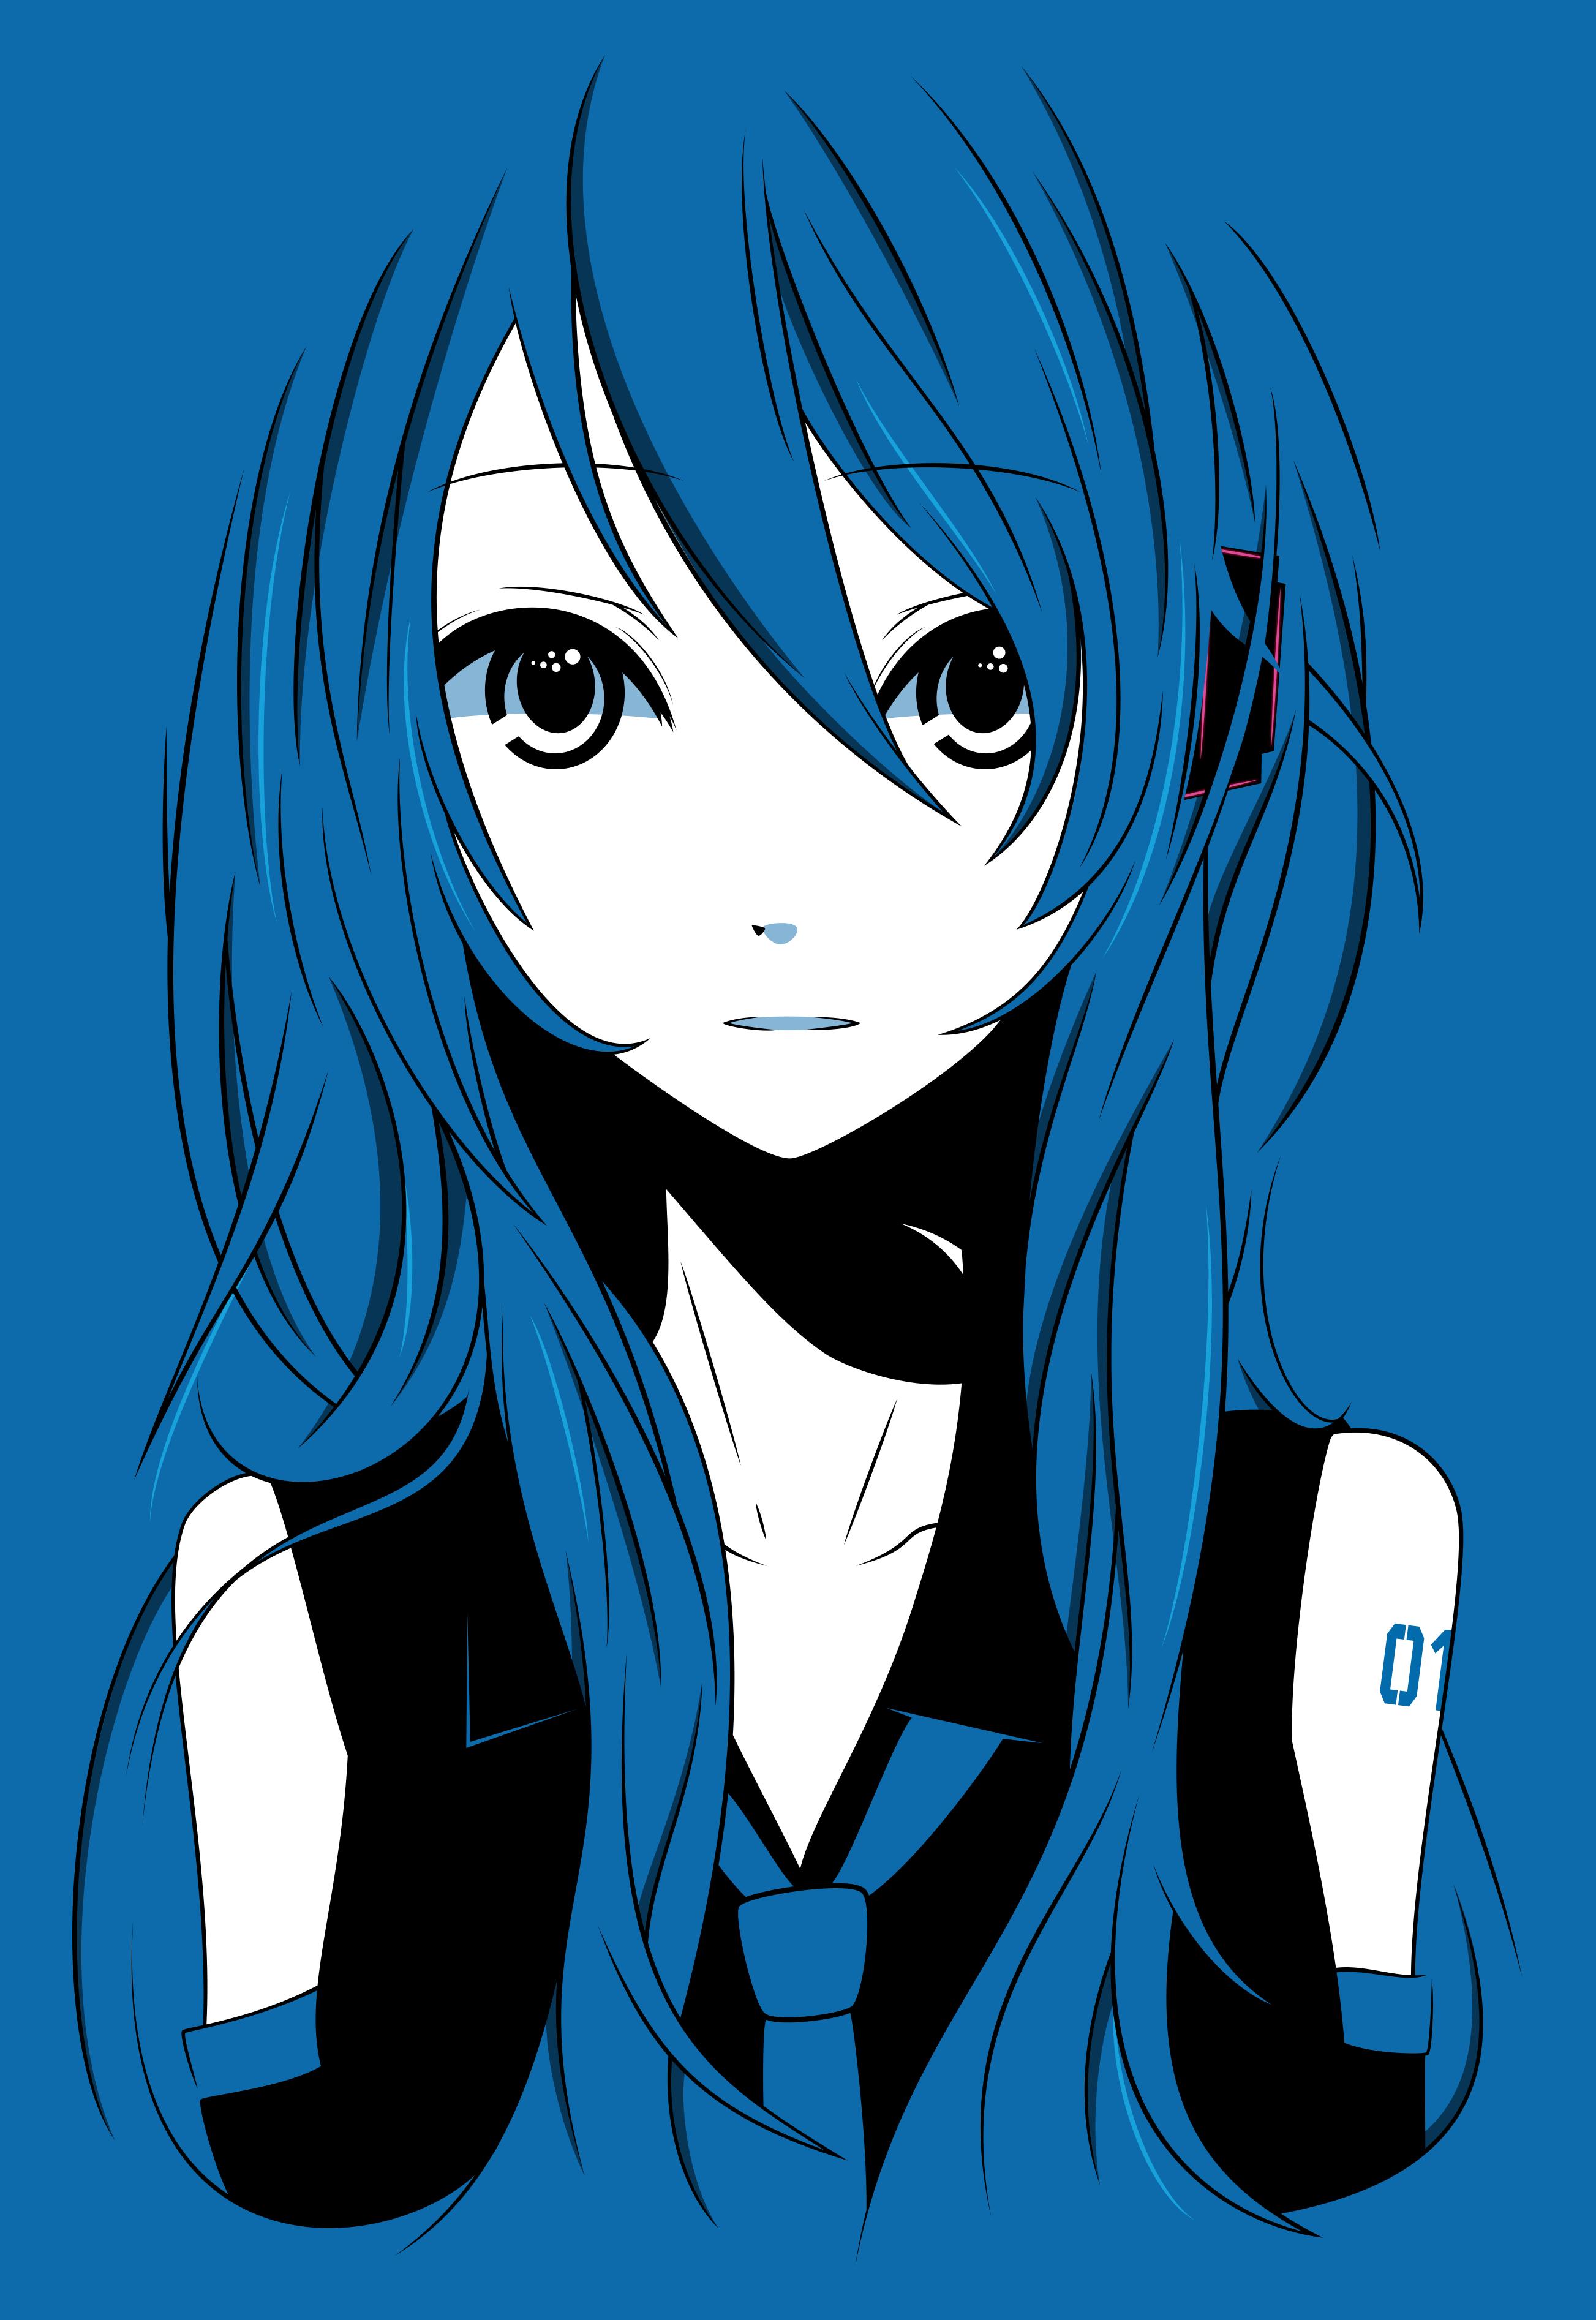 Hatsune Miku Vector by fncombo